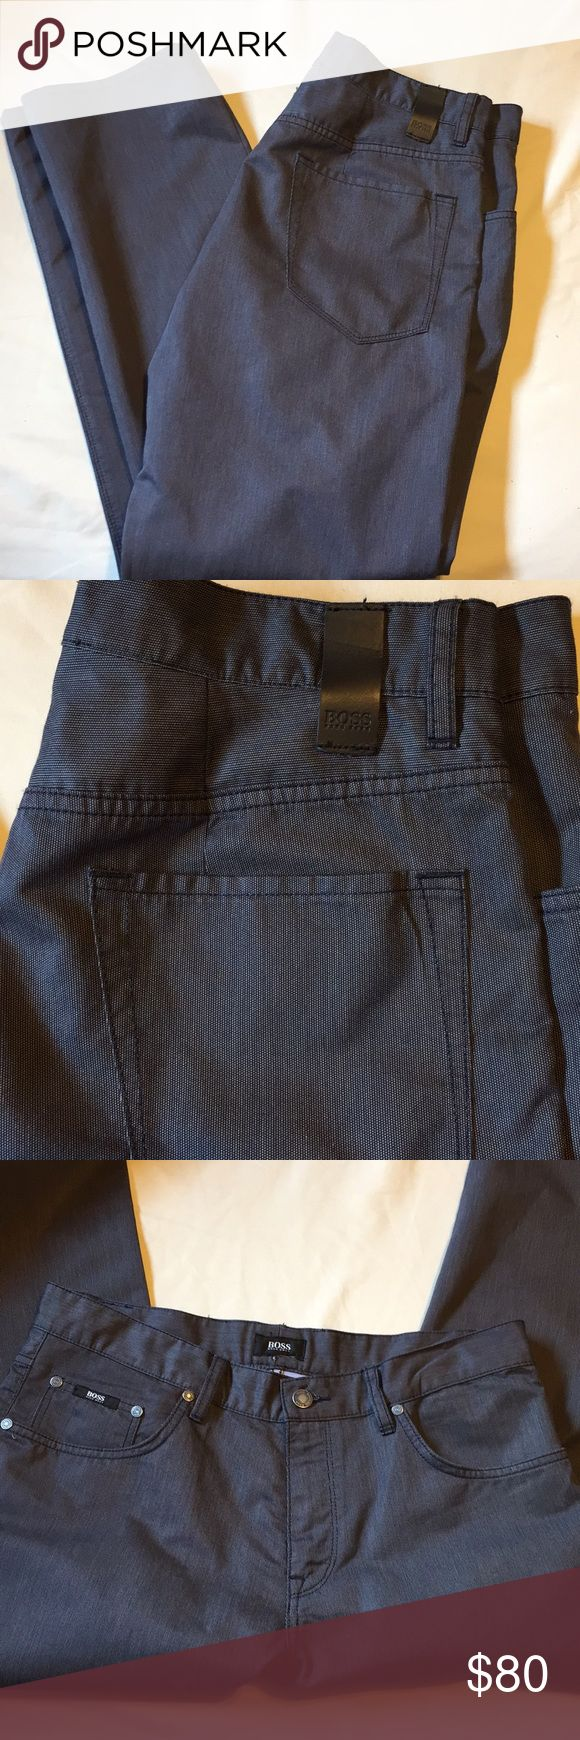 HUGO BOSS men's pant size 34/30 Hugo Boss pants for men. Size 34/30. Gently worn - excellent condition. MAINE regular fit. Hugo Boss Pants Chinos & Khakis